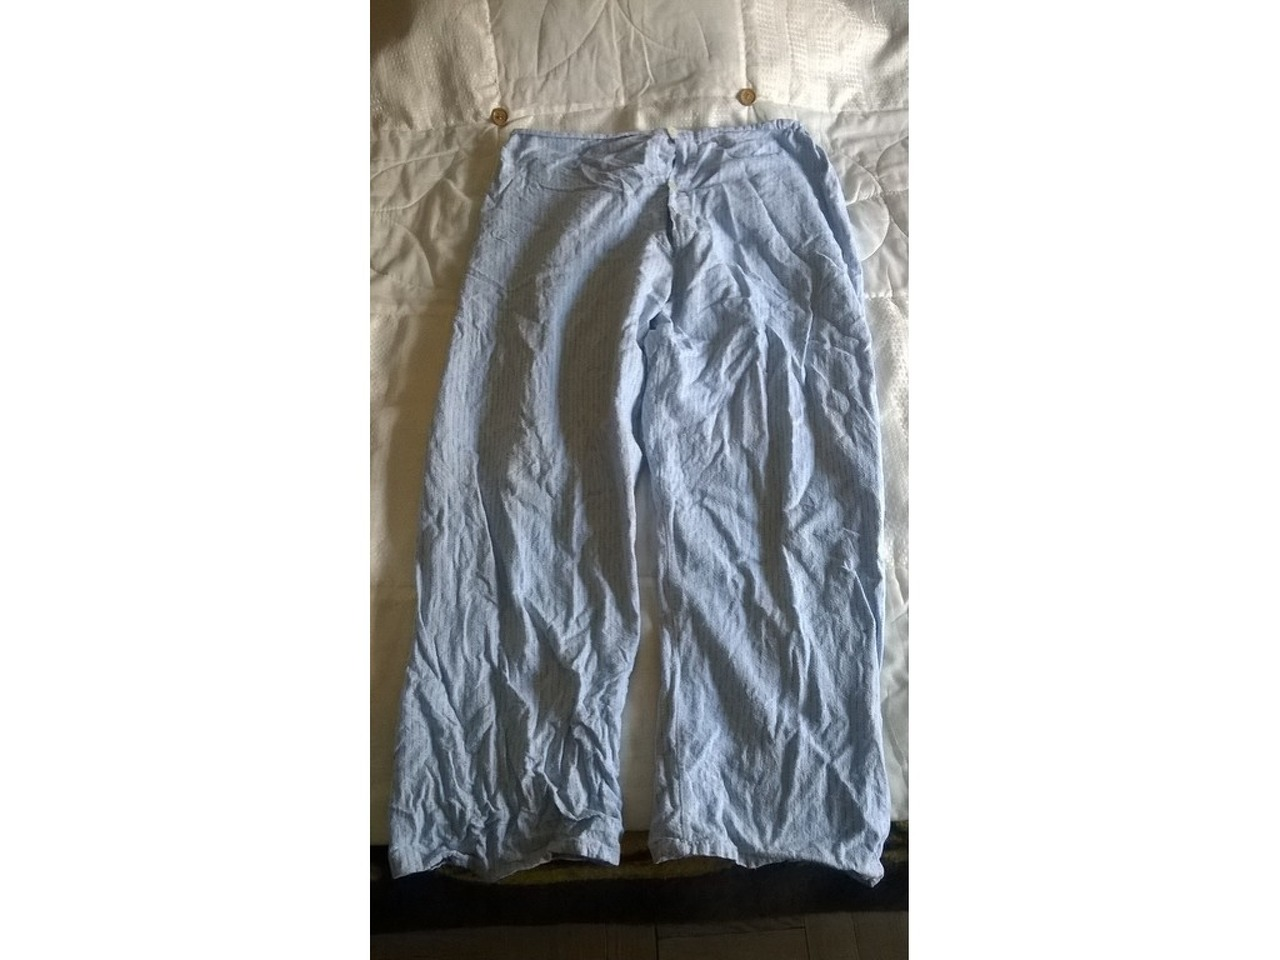 Pijamas (segunda mão) - 5/12